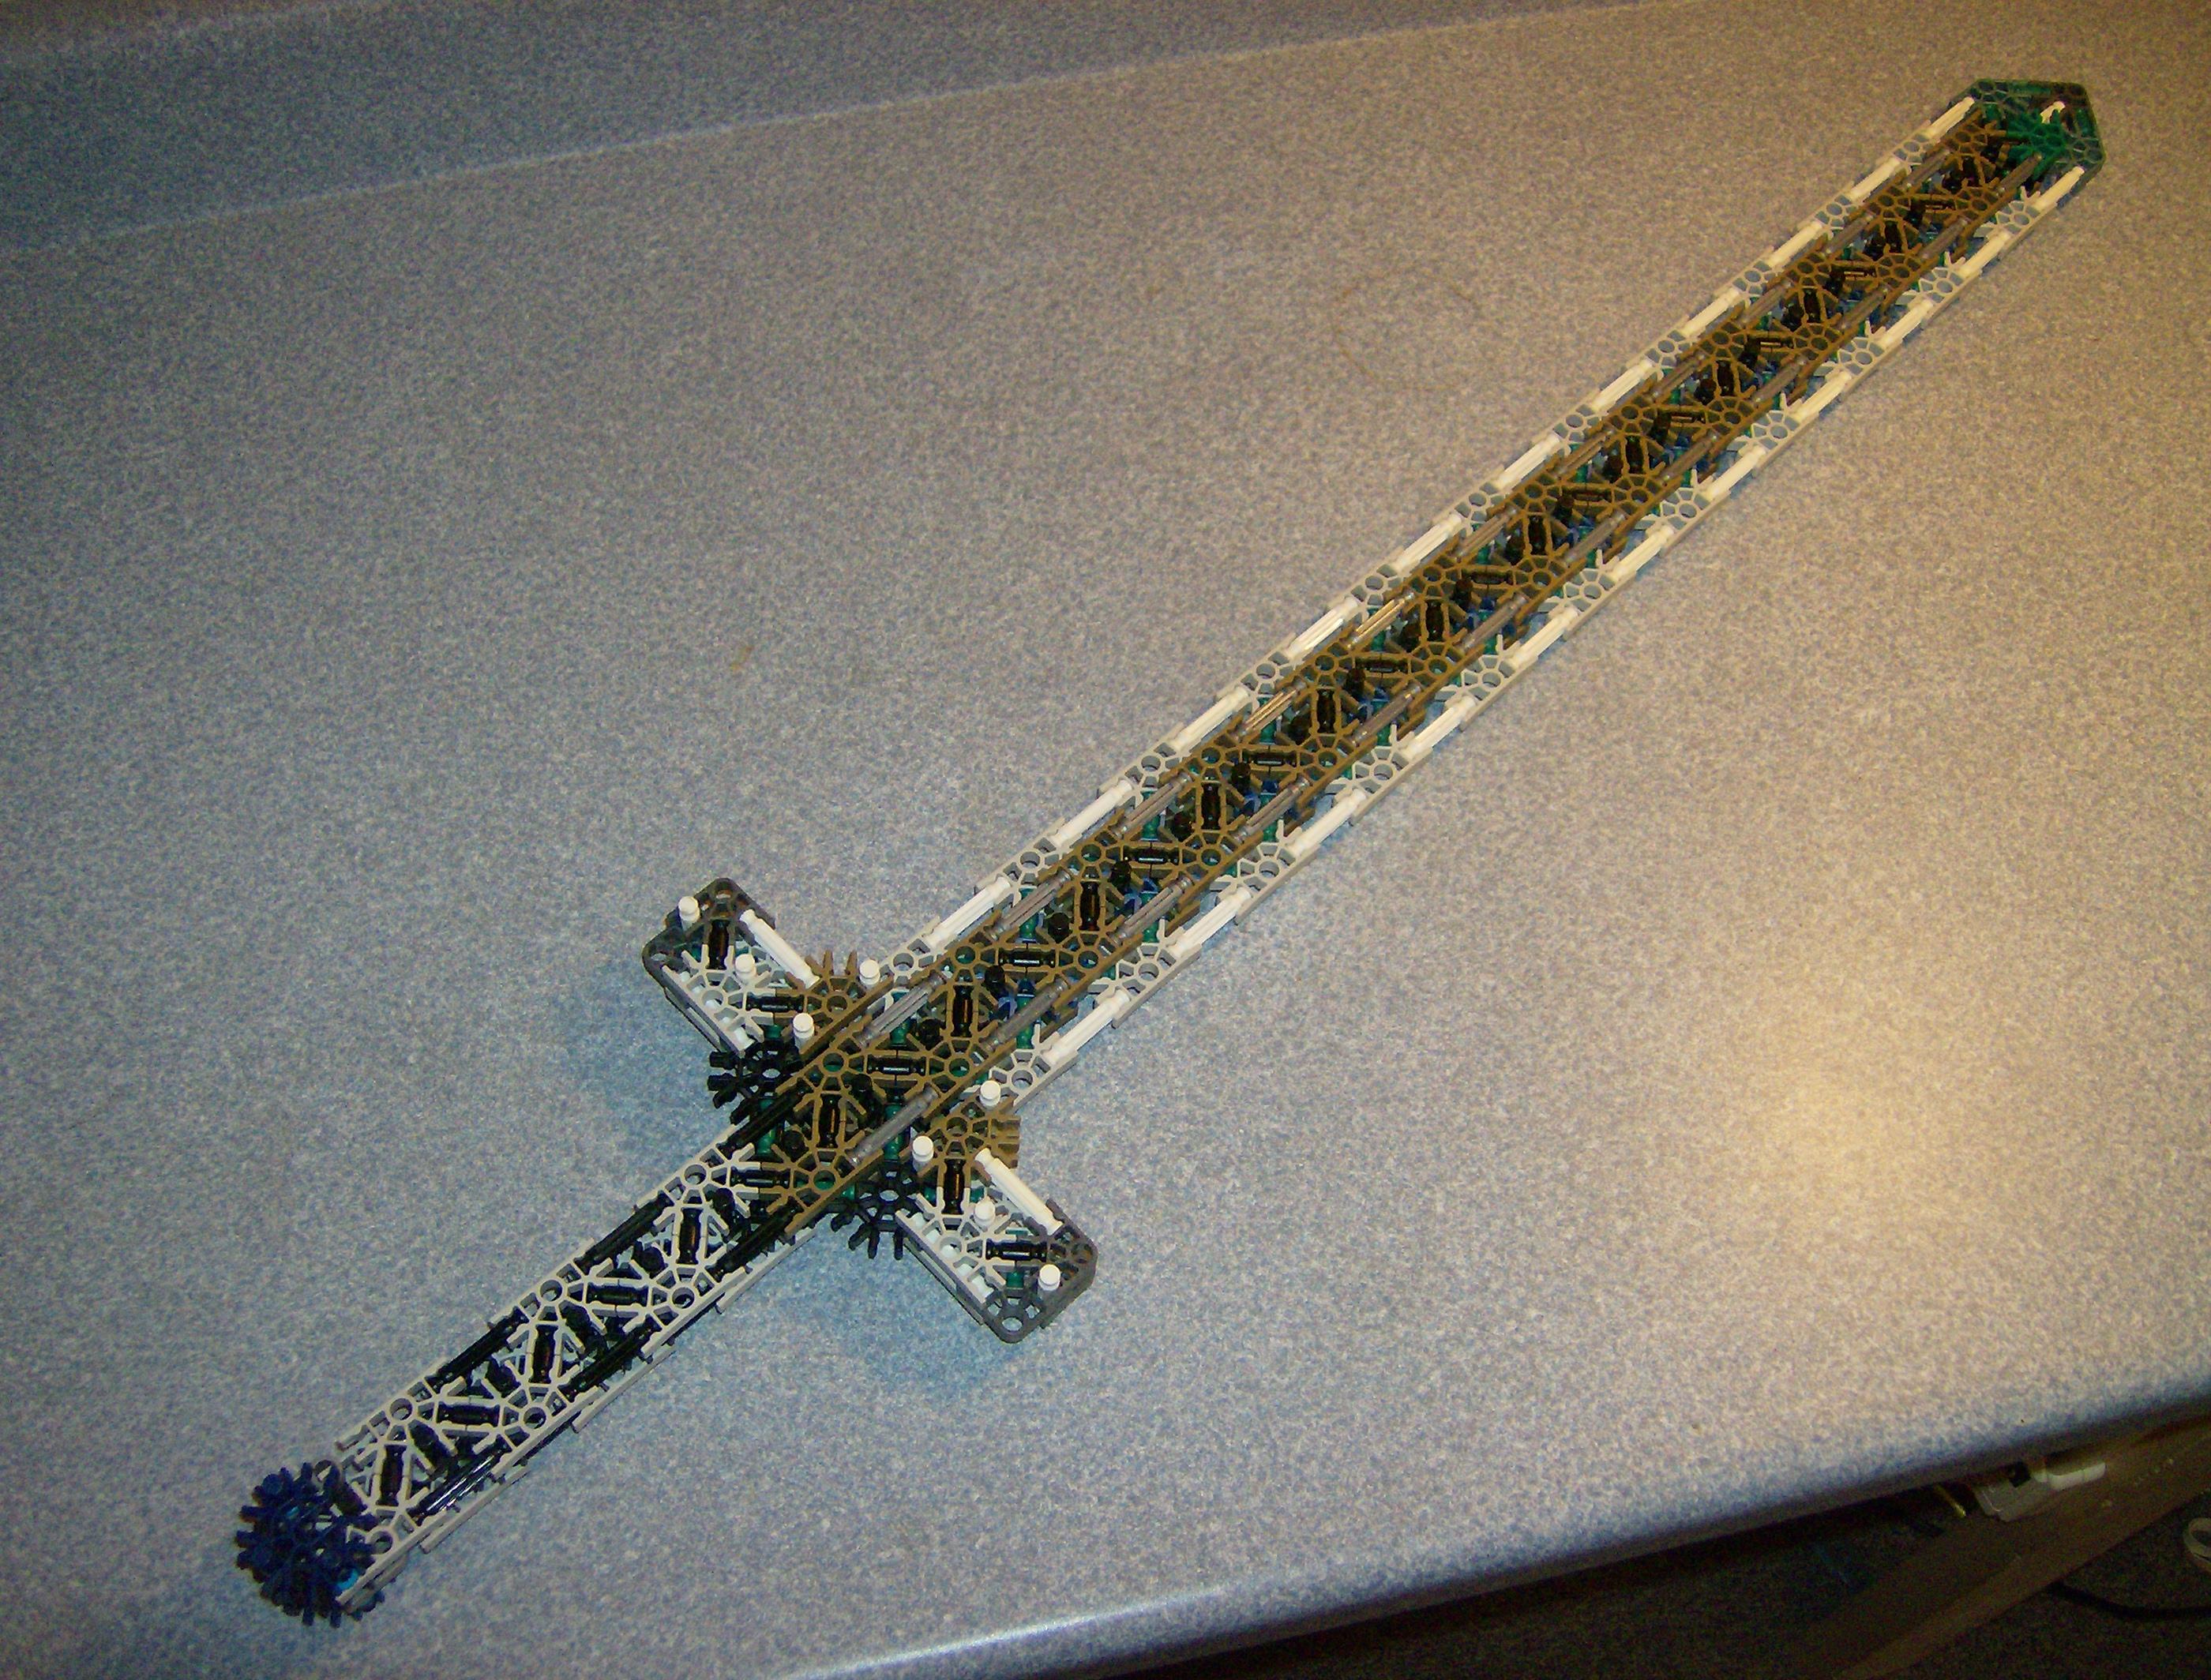 K'nex Medieval Broadsword